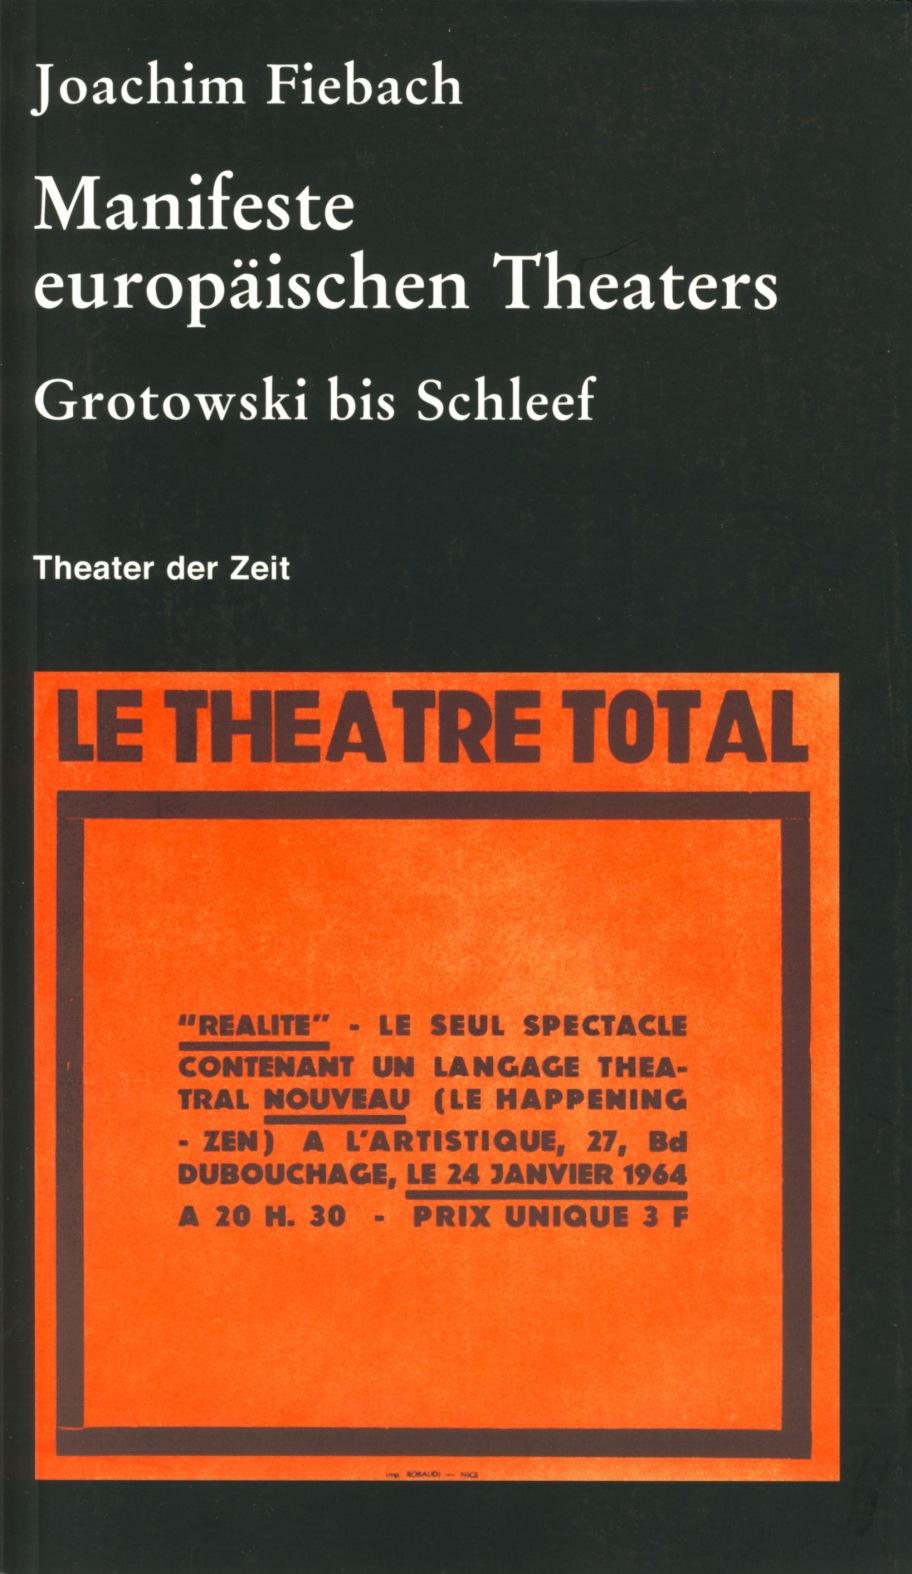 Manifeste europäischen Theaters